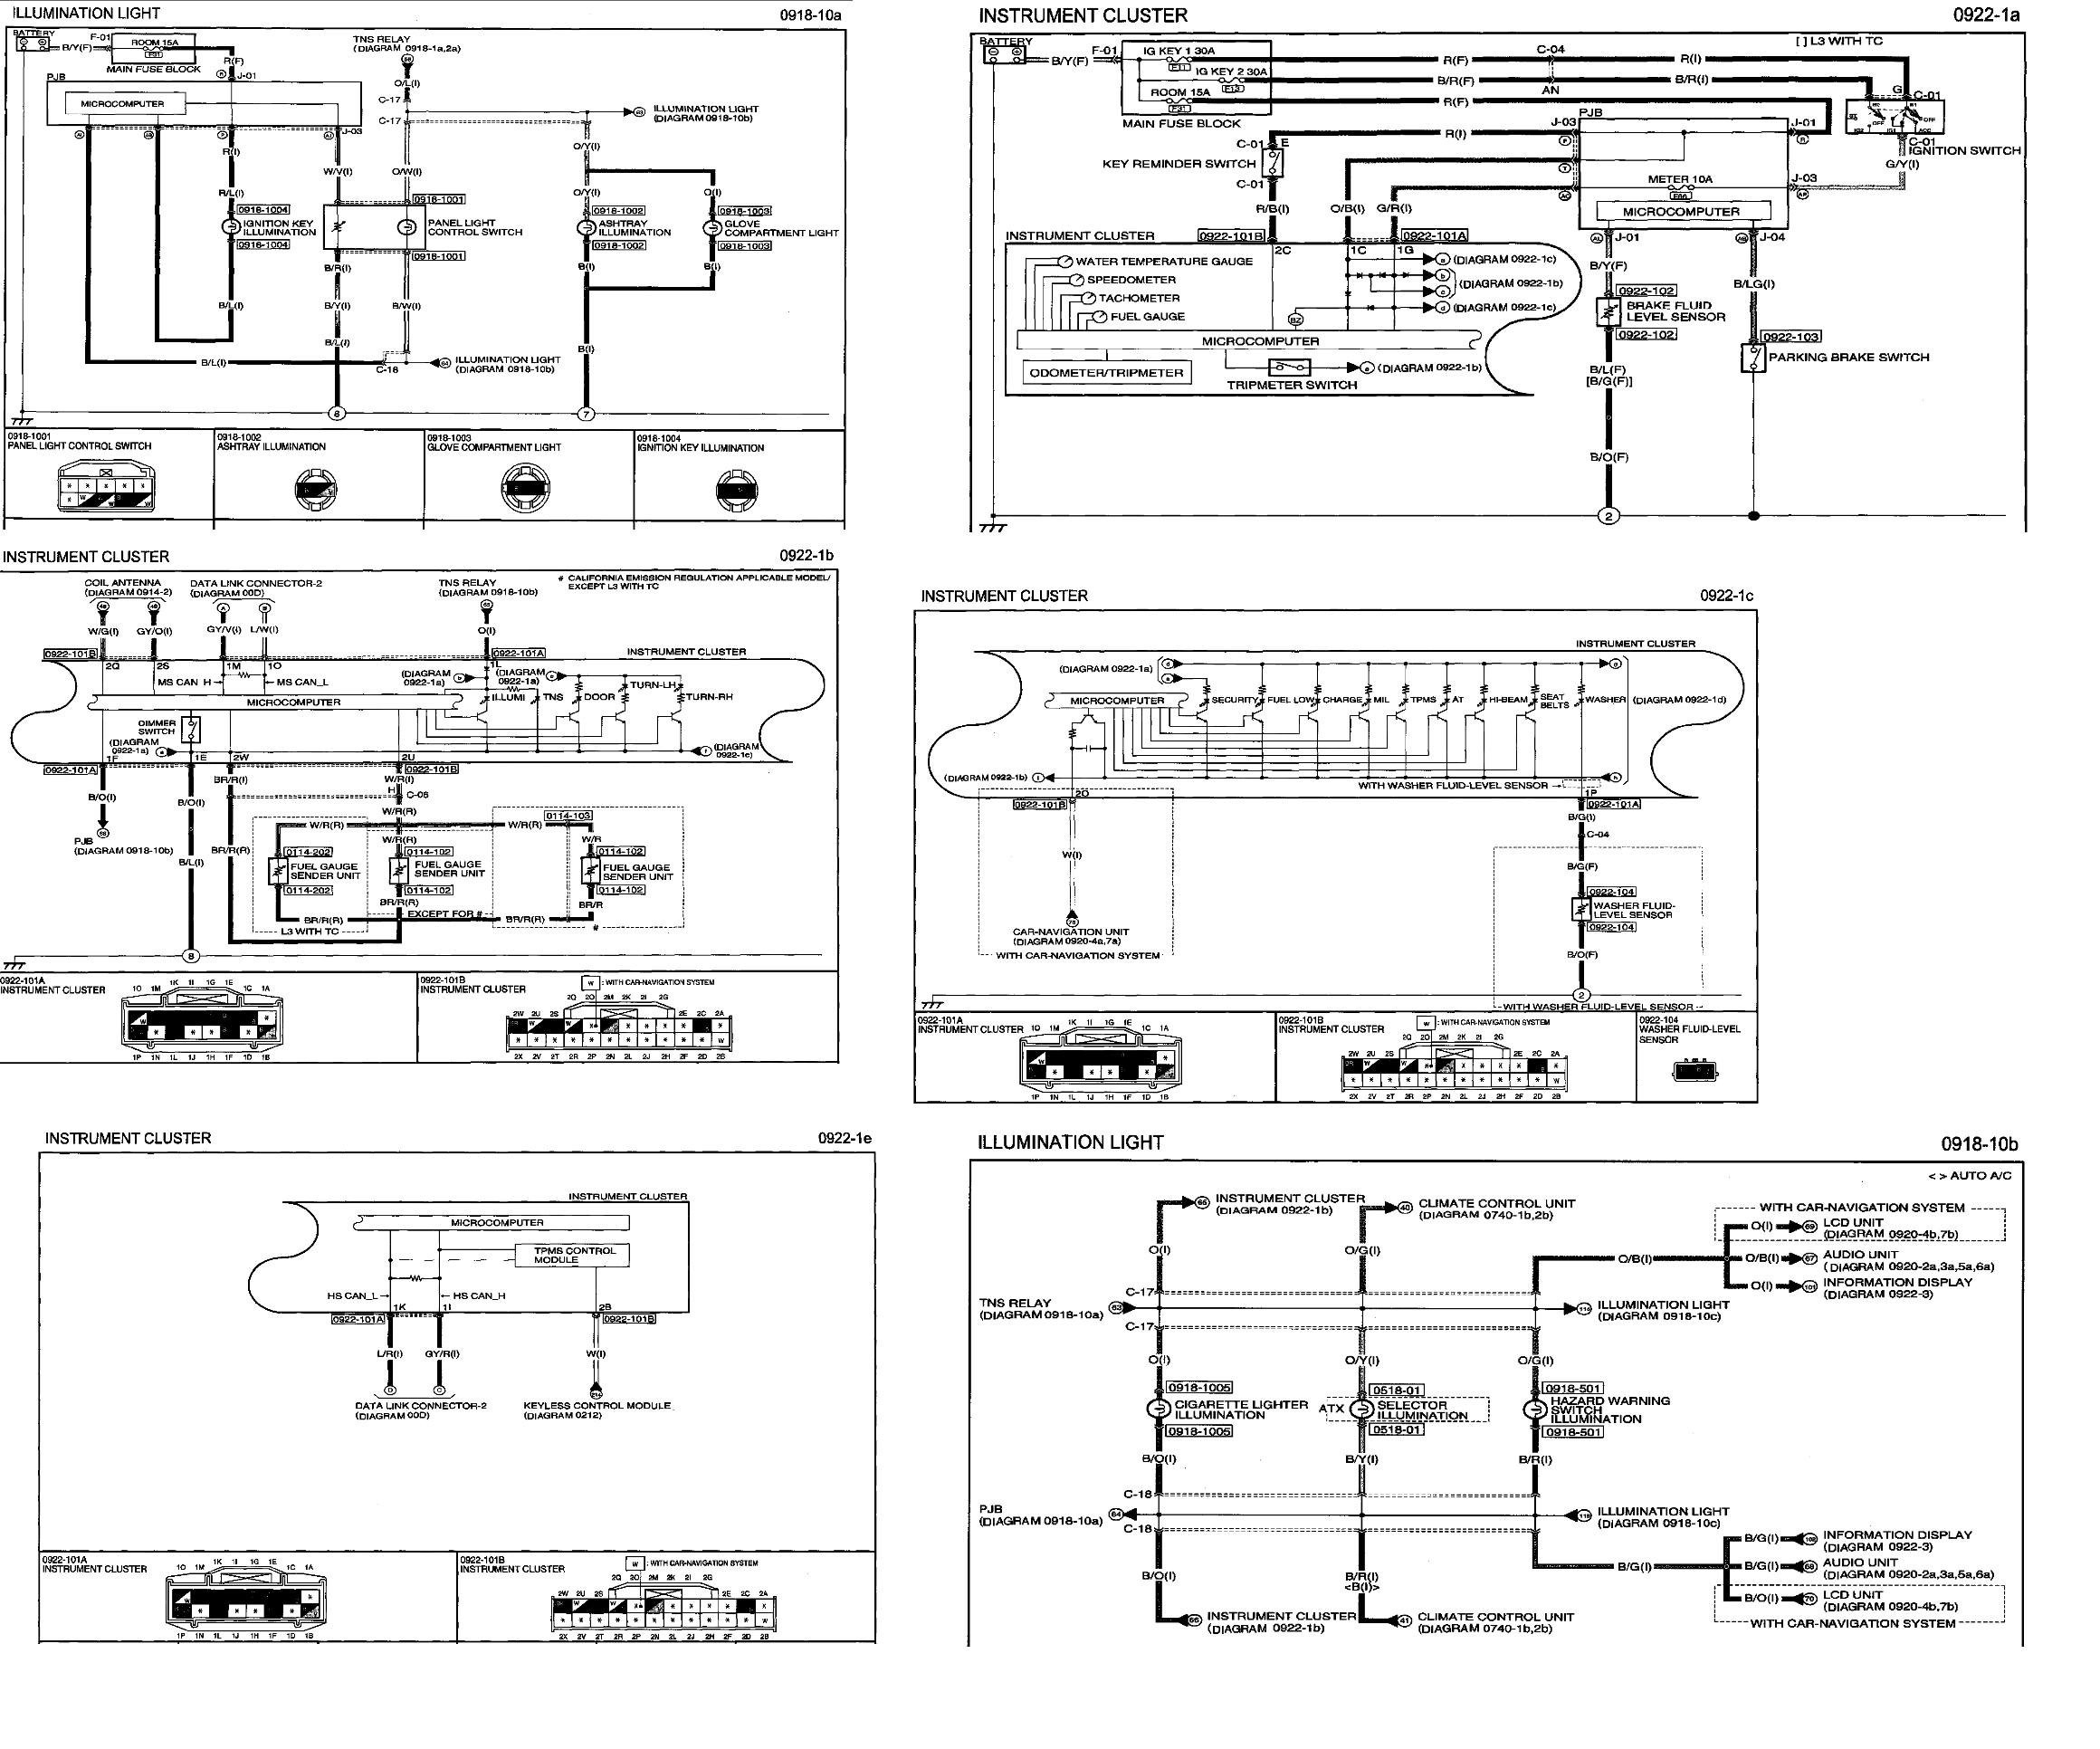 2010 Mazda 3 Wiring Diagram Diagram] Mazda 3 Wiring Diagram 2010 Full Version Hd Quality